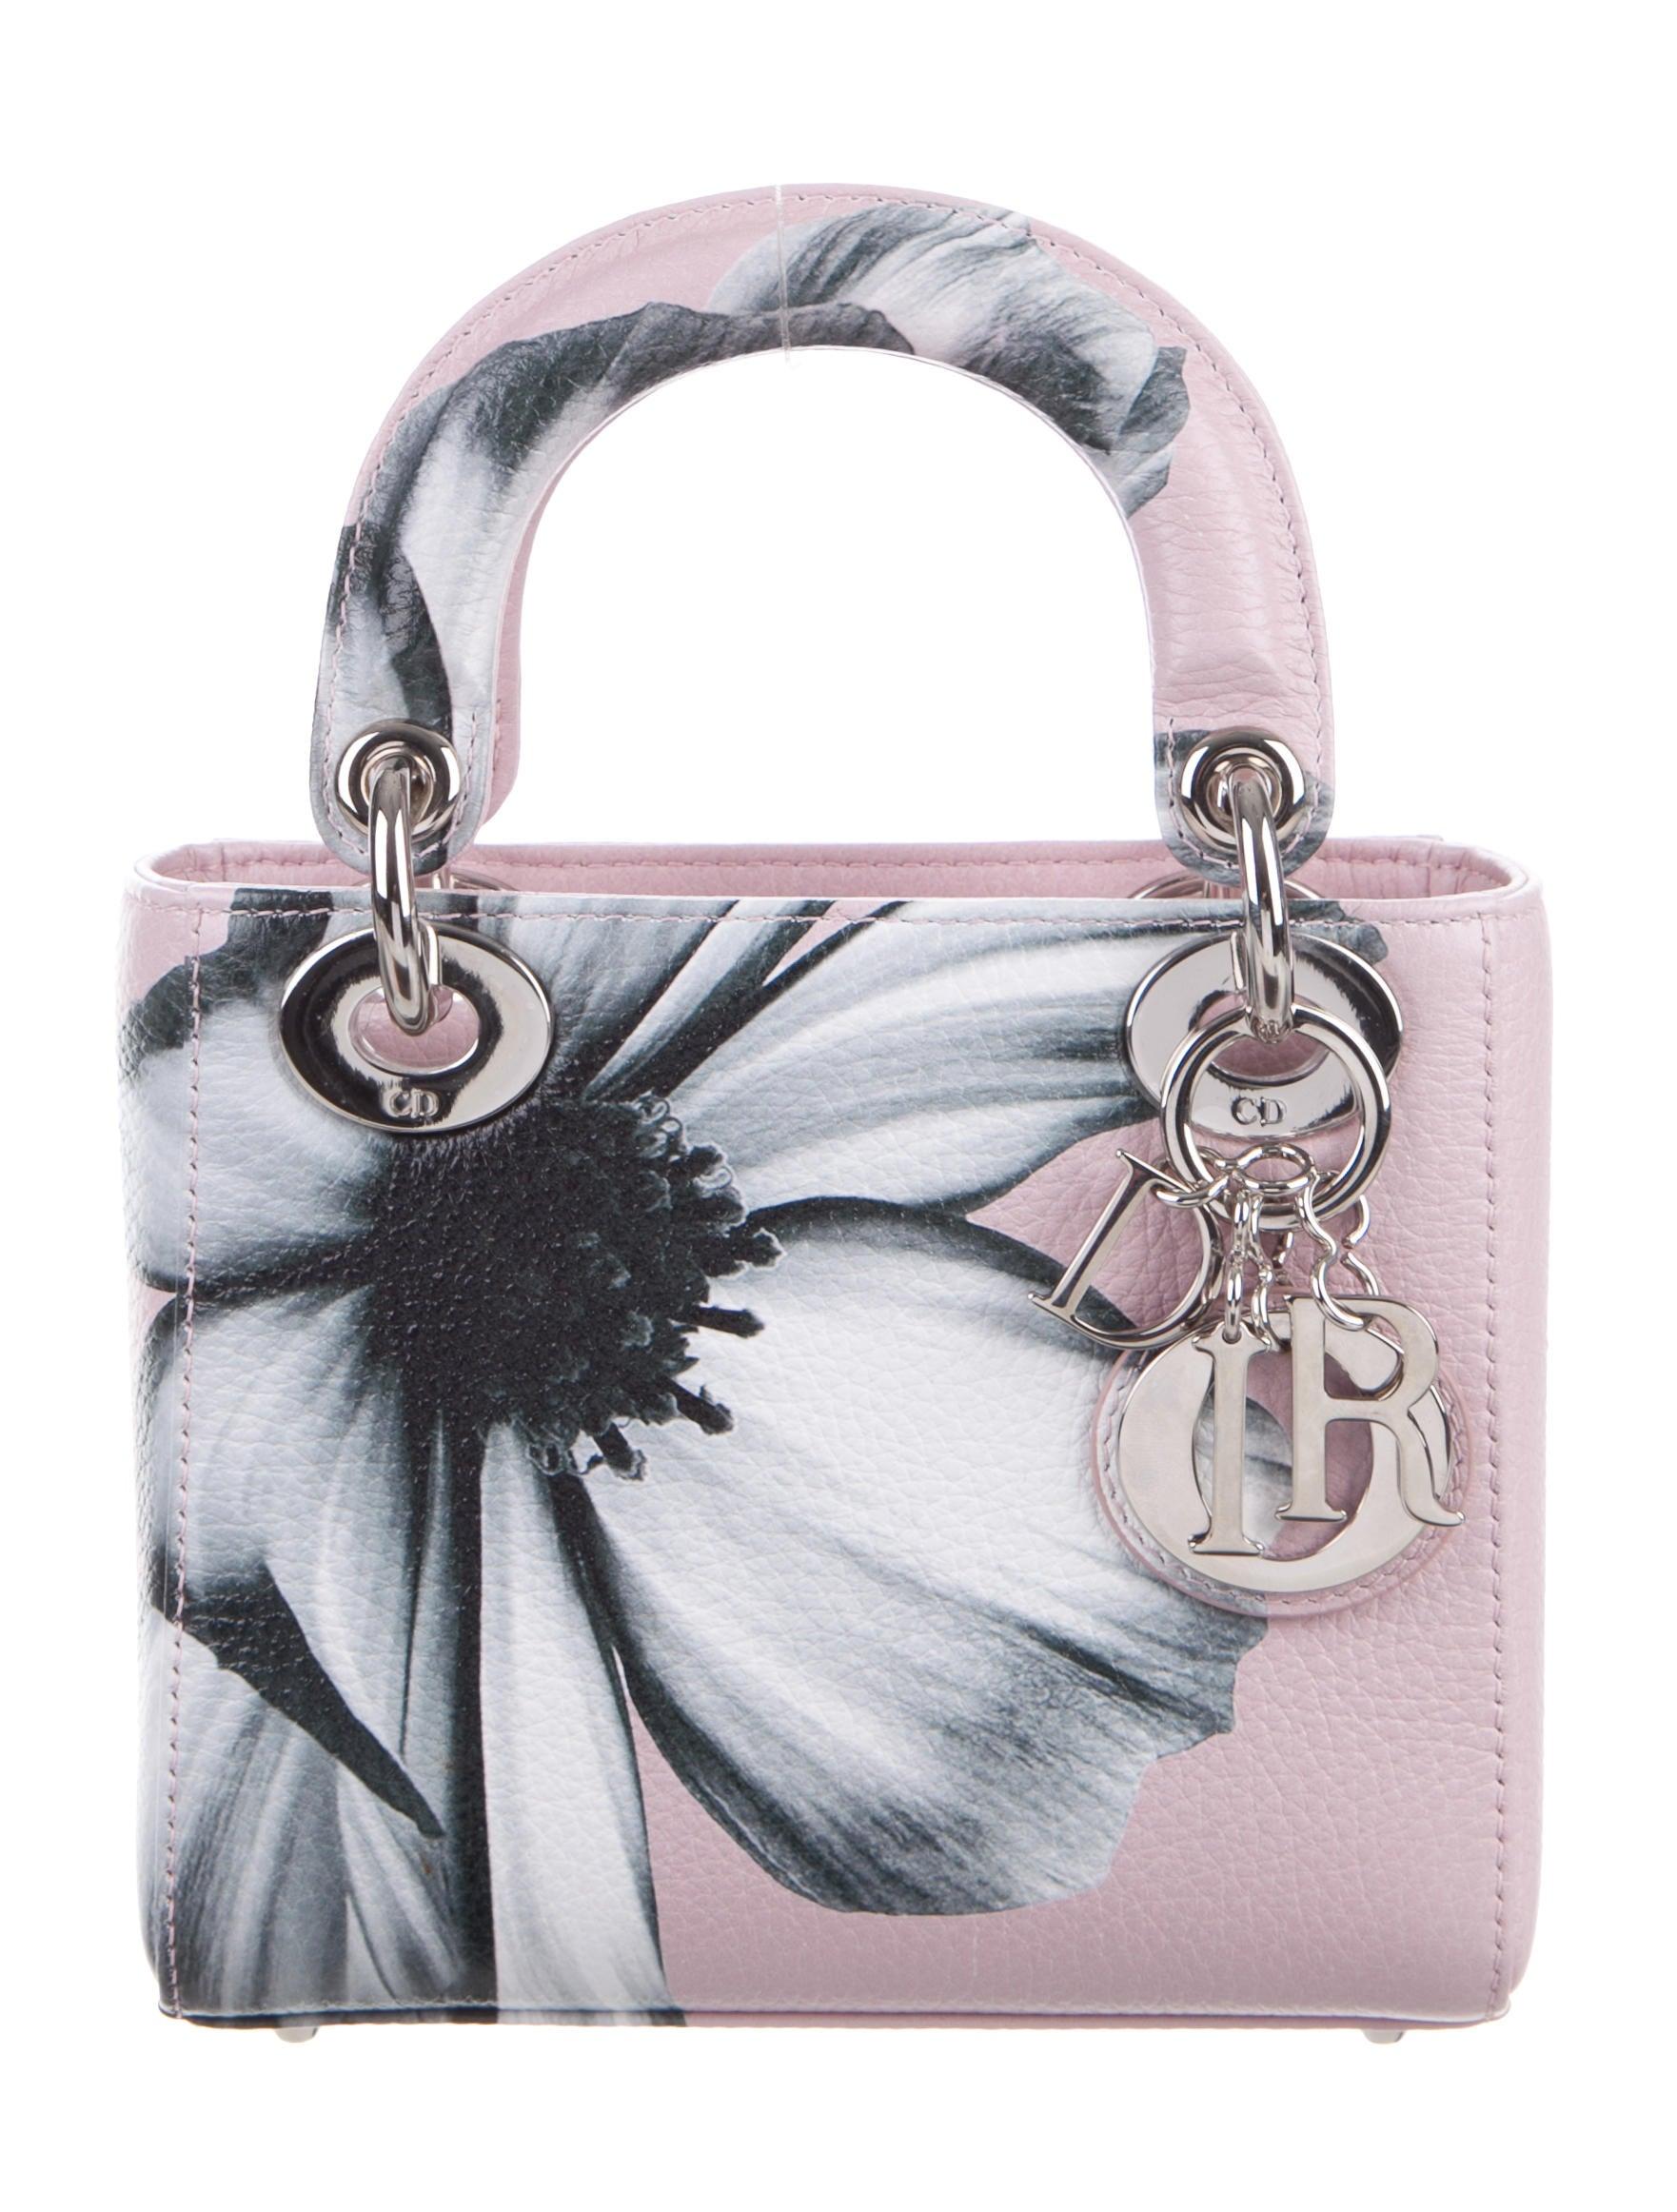 christian dior mini lady dior bag handbags chr48828 the realreal. Black Bedroom Furniture Sets. Home Design Ideas